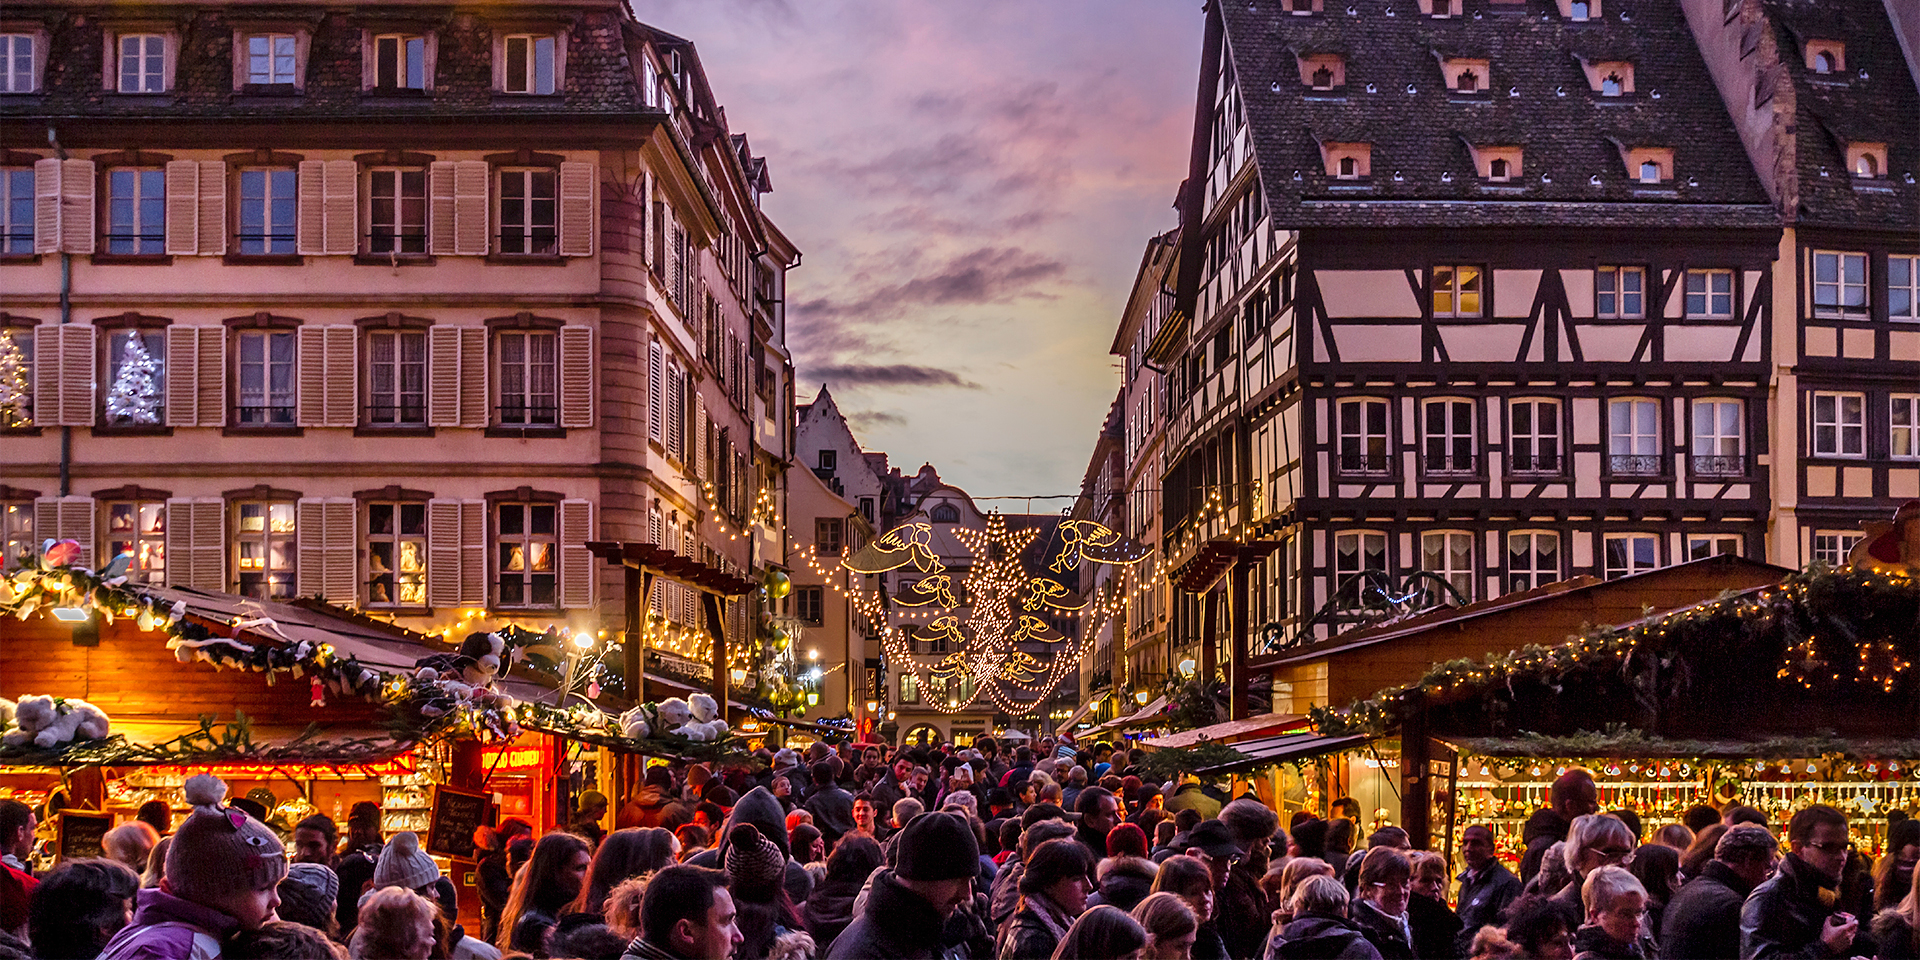 Târgul de Crăciun de la Strasbourg s-a redeschis